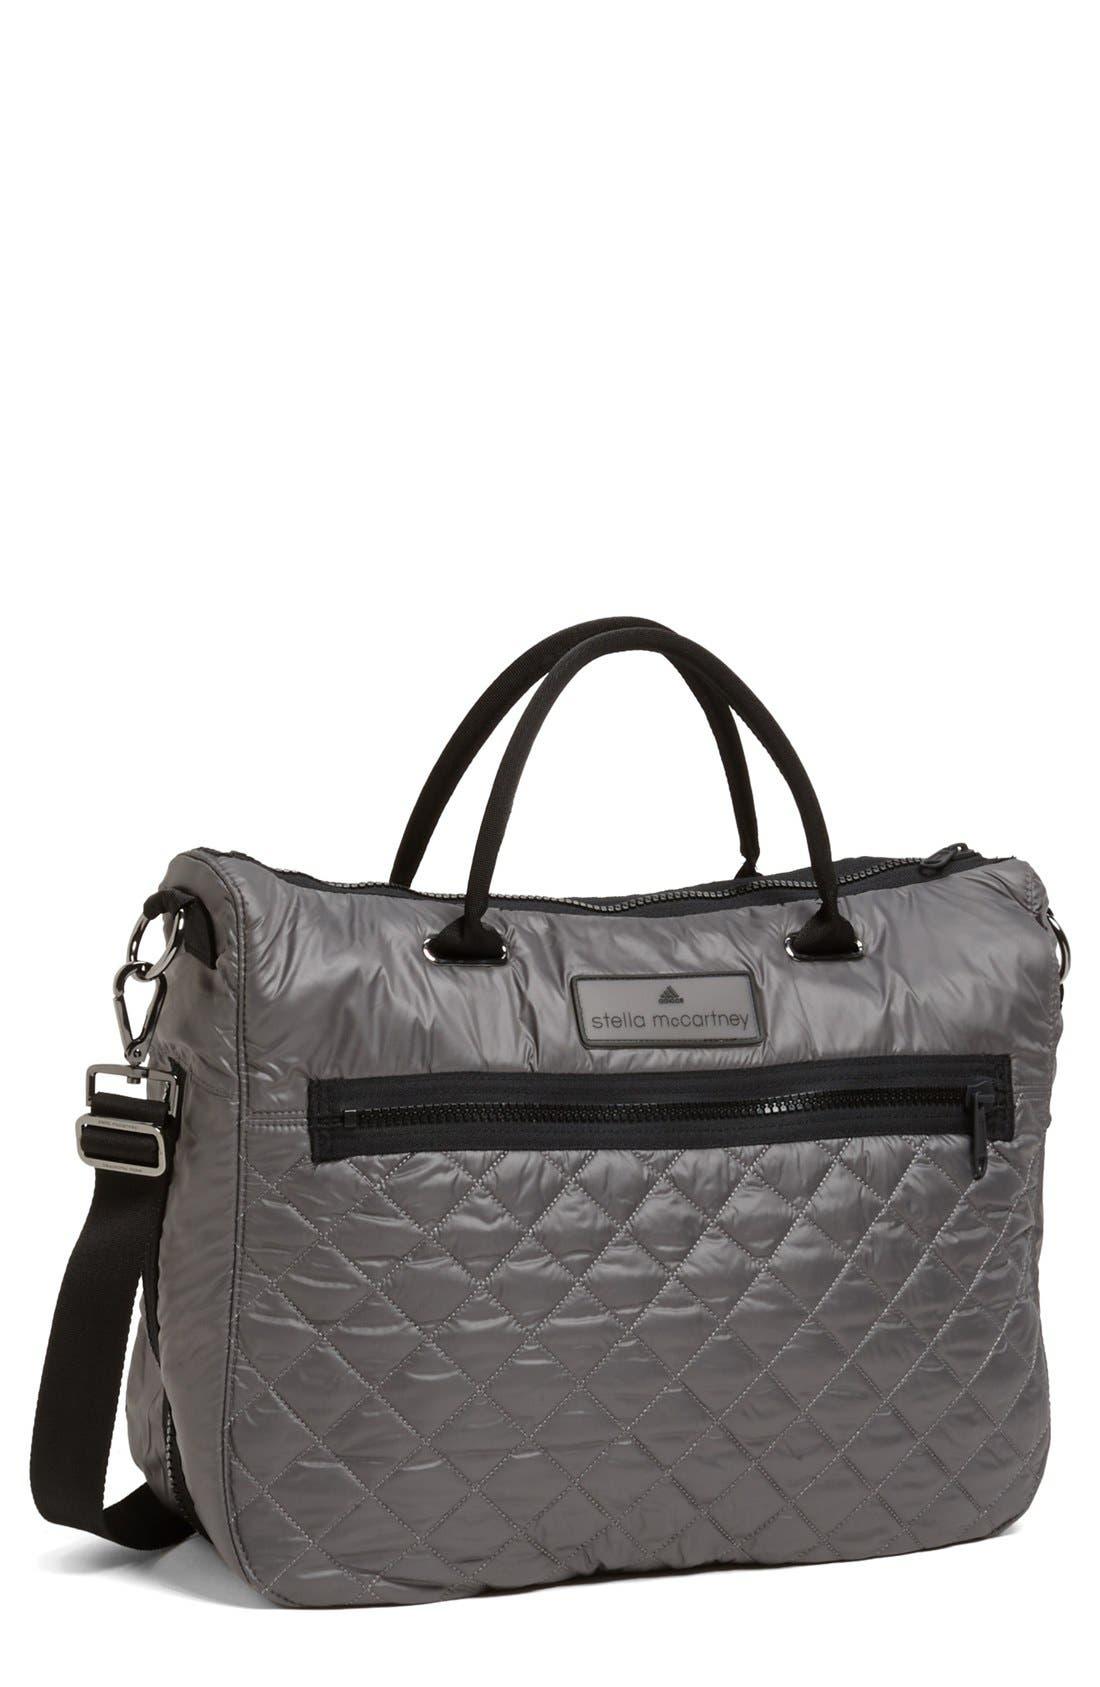 Alternate Image 1 Selected - adidas by Stella McCartney 'Fashion' Bag